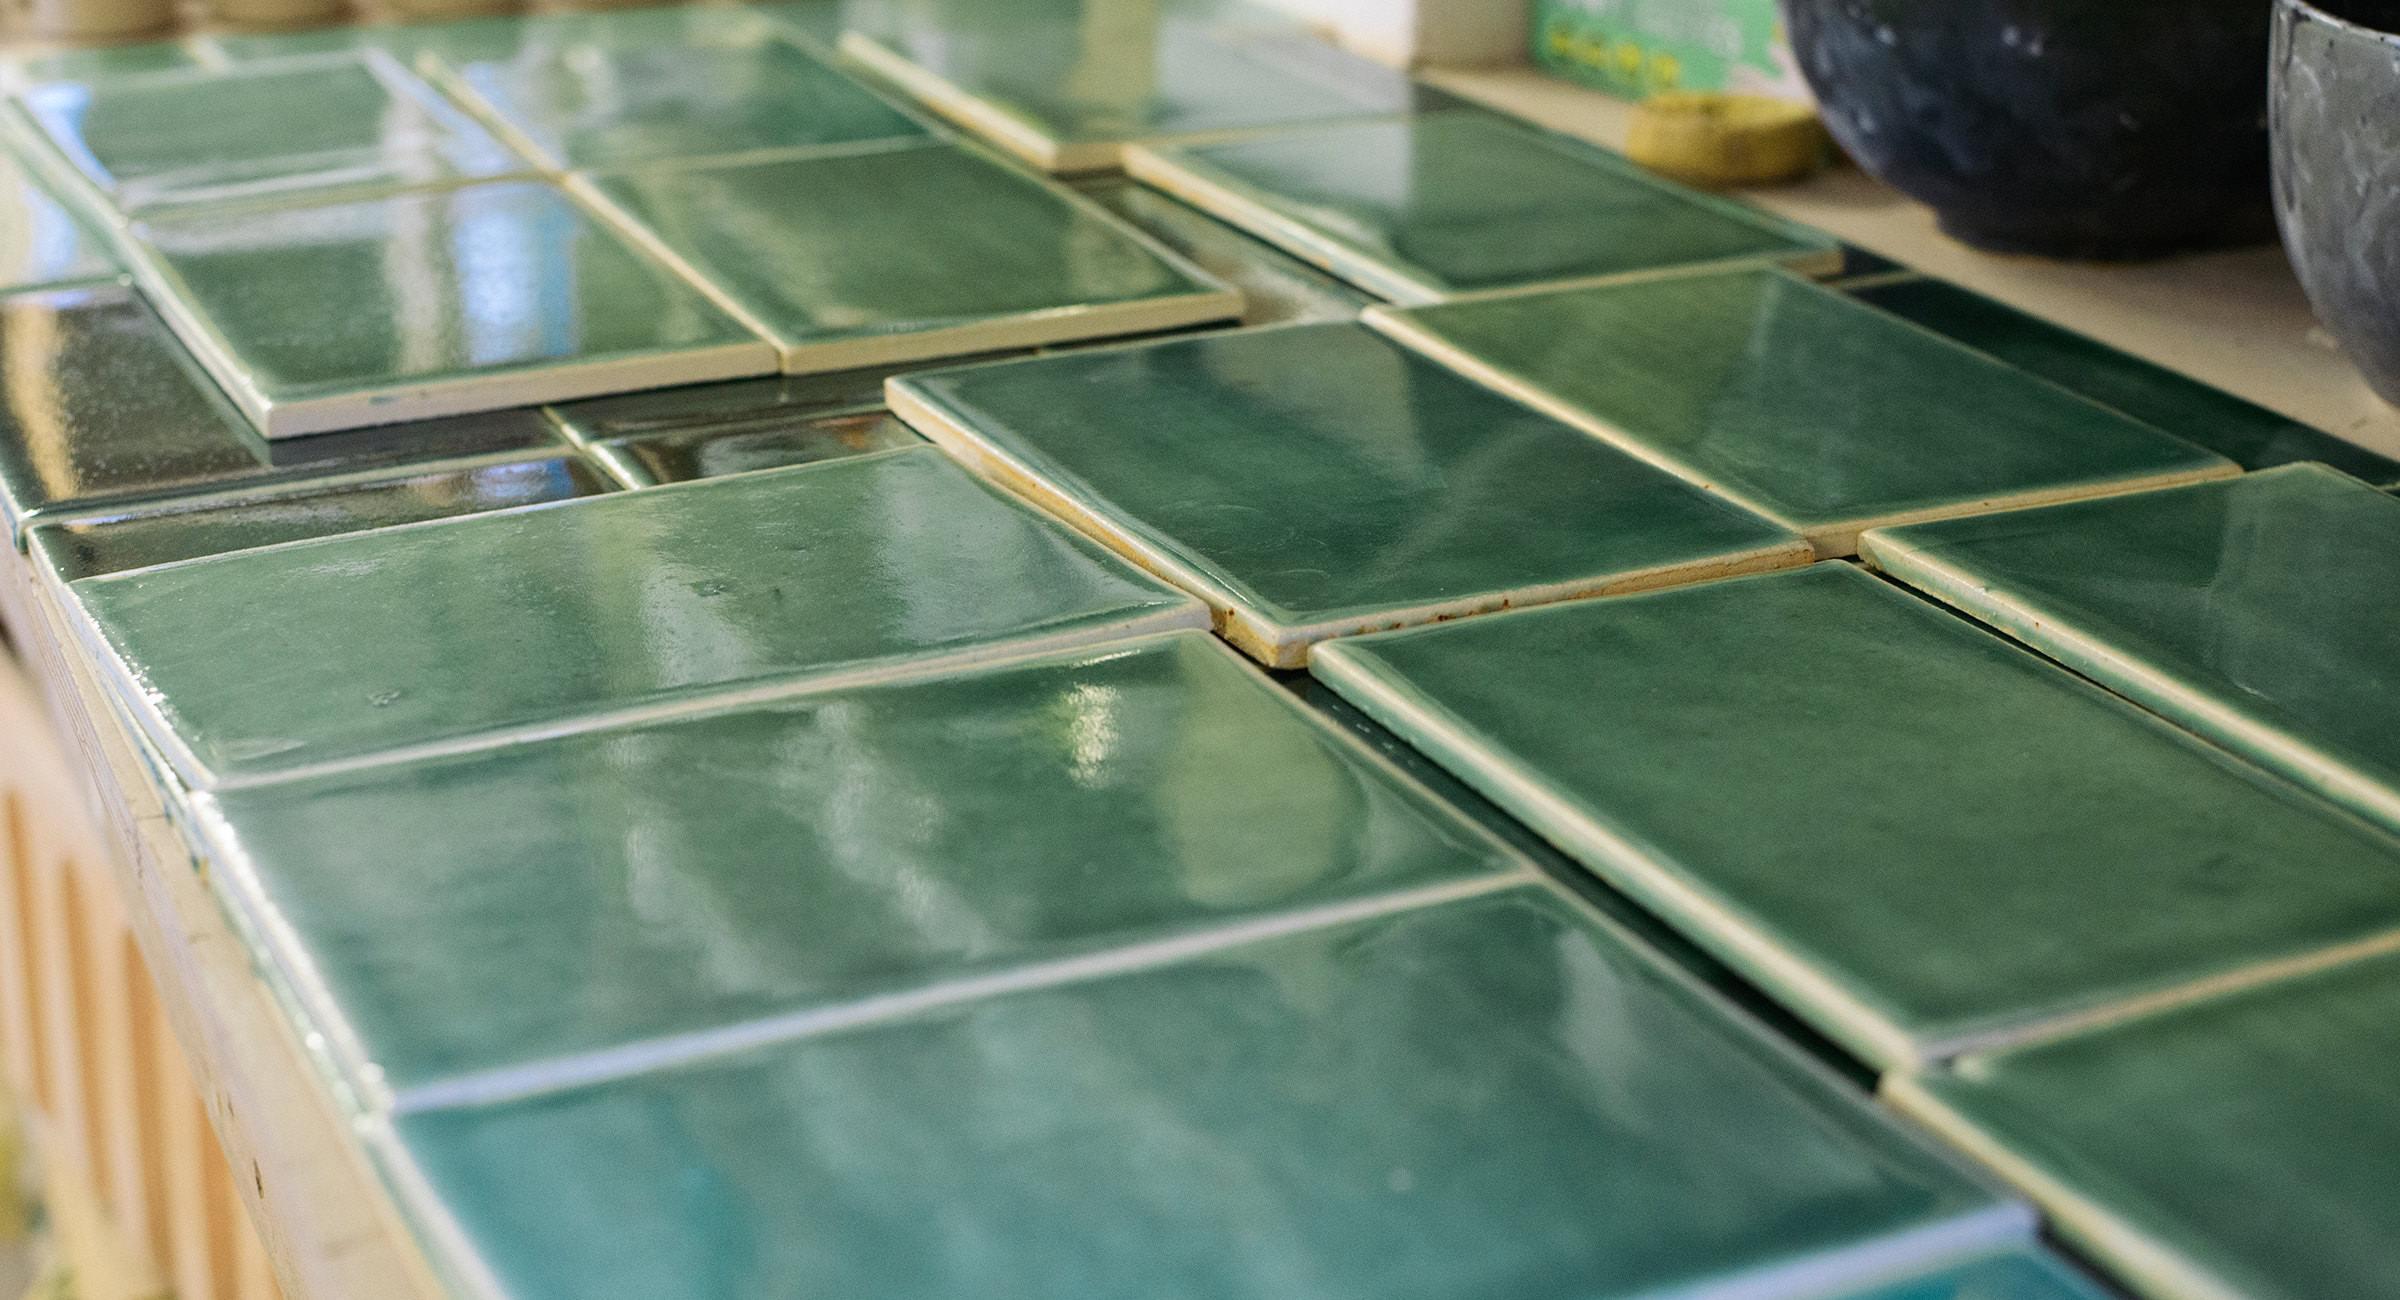 deVOL Emerald Green London Tiles photo 5